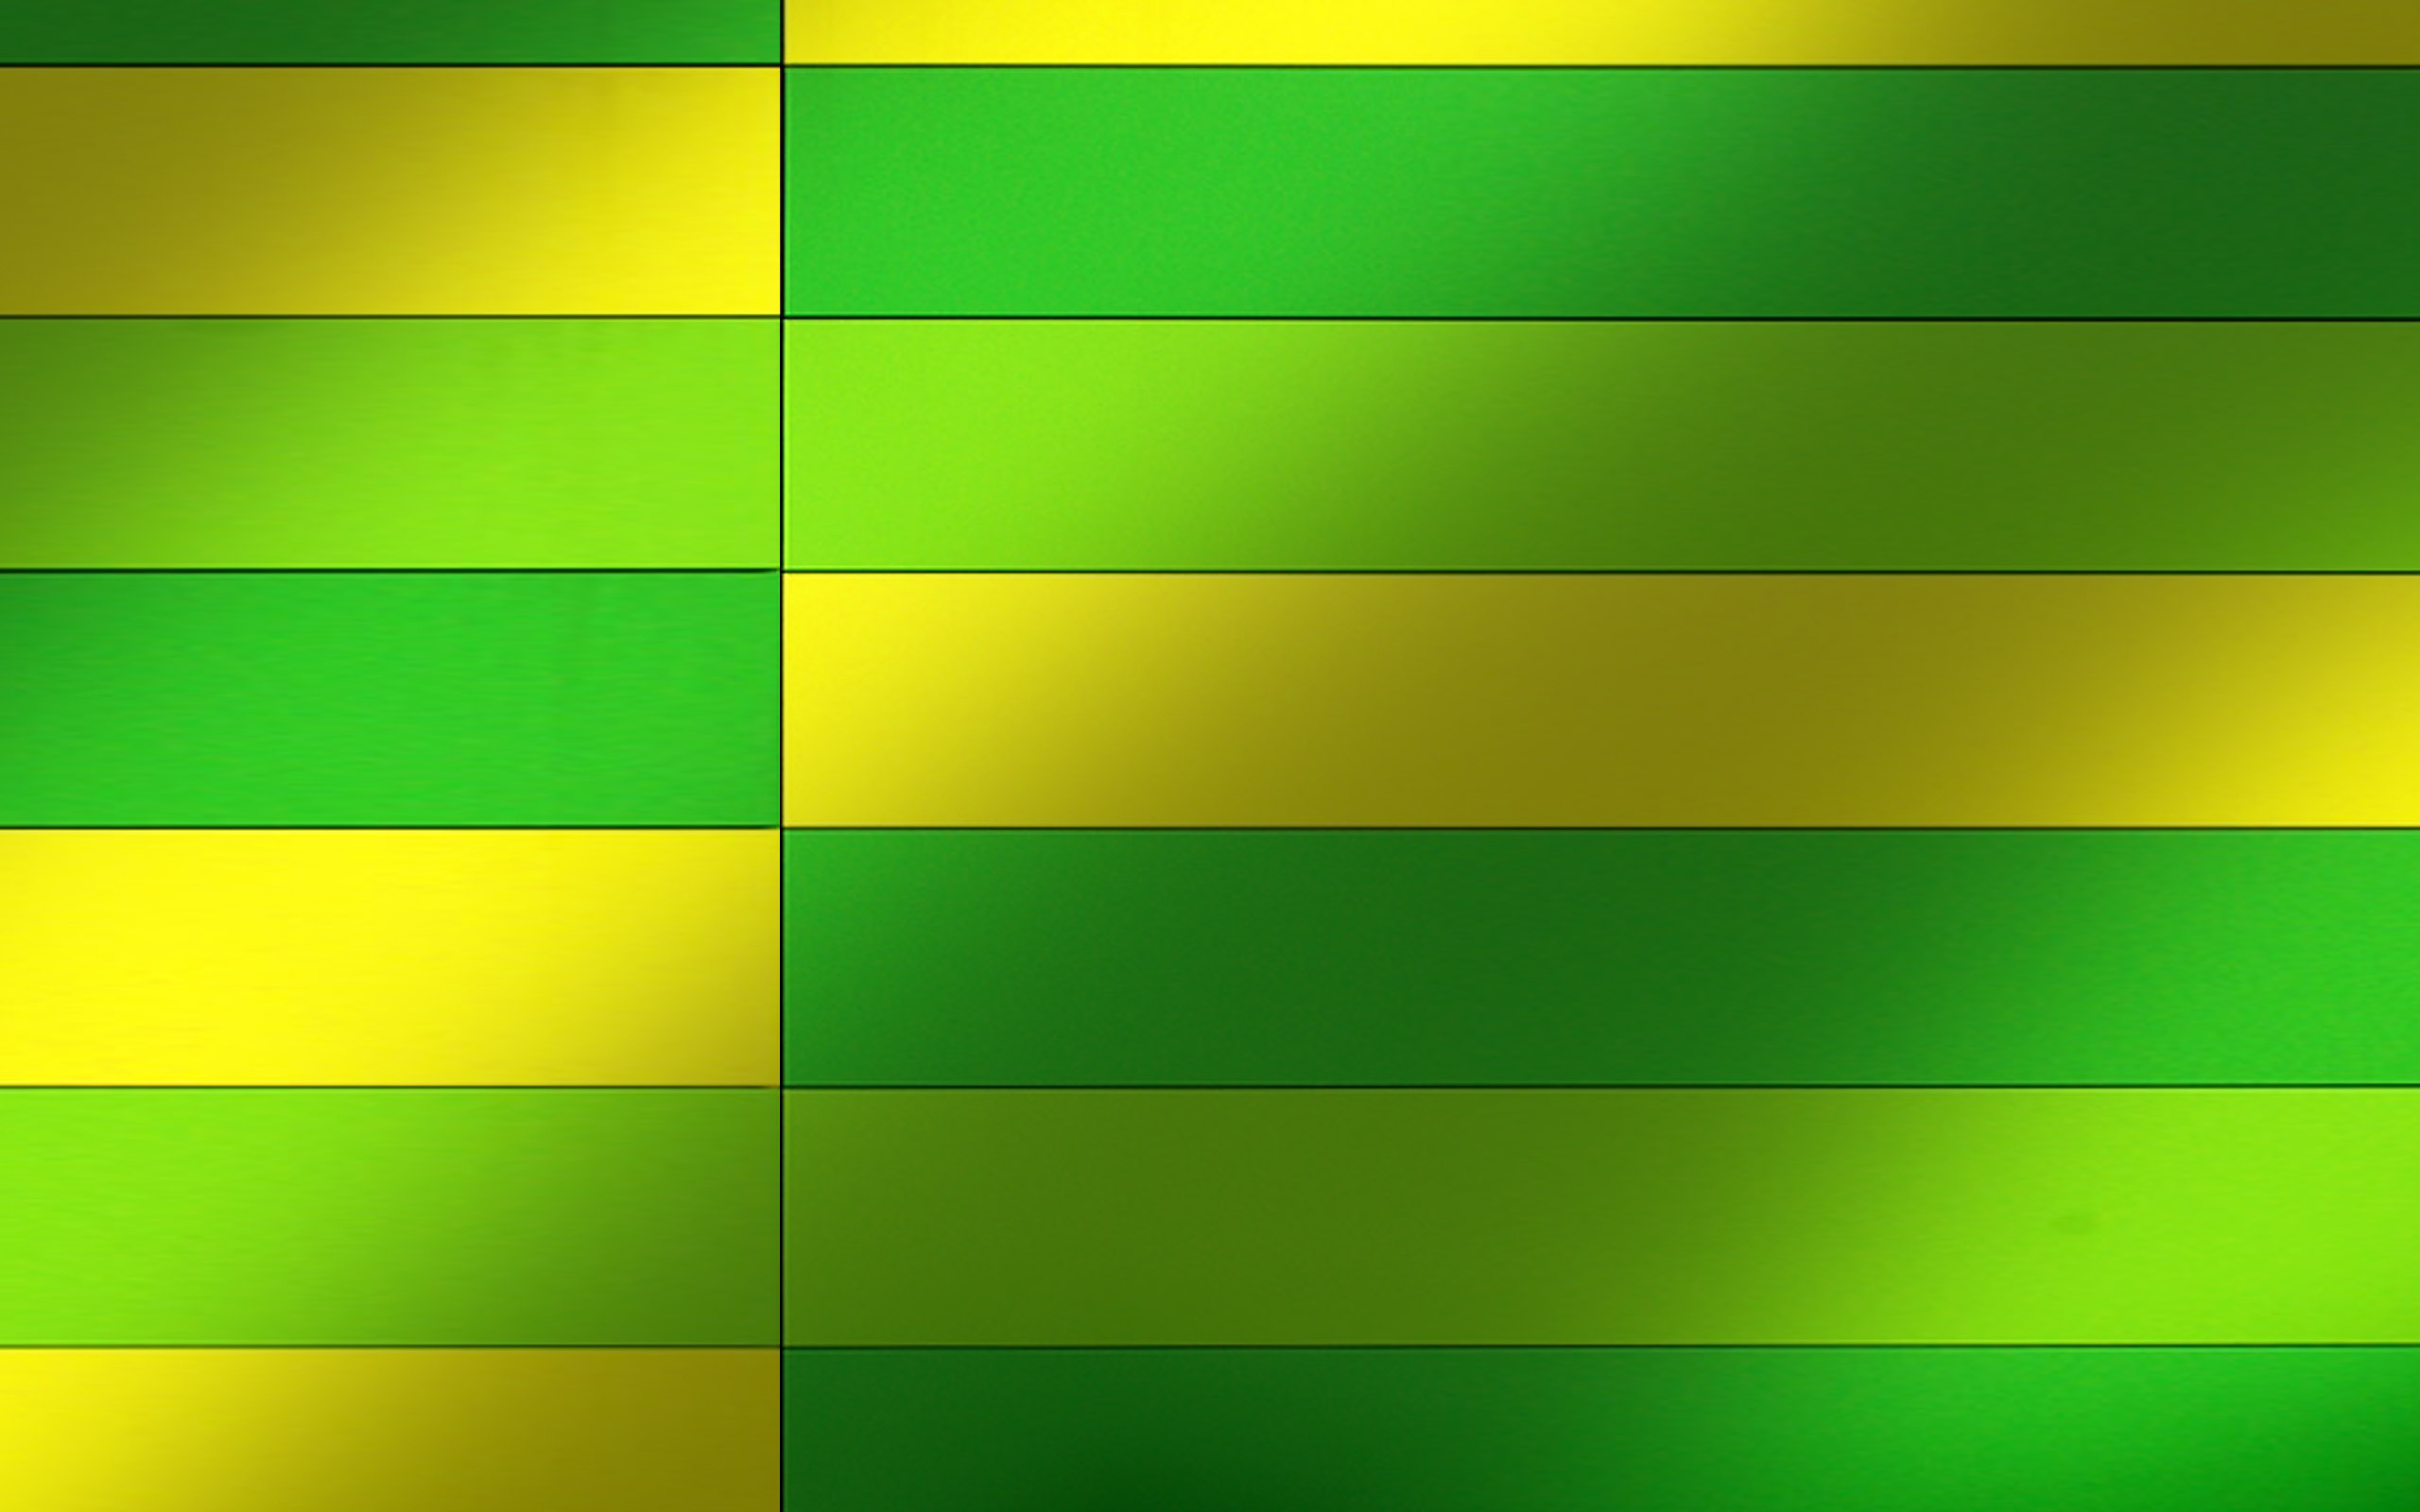 Yellow and Green Wallpaper - WallpaperSafari